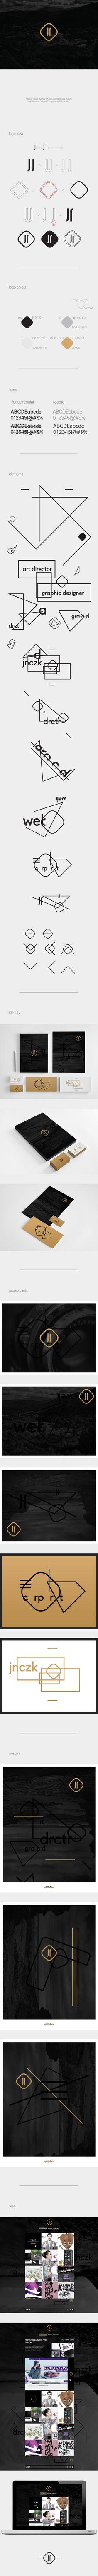 JNCZK - Visual Identity by J N CZ K, via Behance | #stationary #corporate #design #corporatedesign #logo #identity #branding #marketing <<< repinned by an #advertising agency from #Hamburg / #Germany - www.BlickeDeeler.de | Follow us on www.facebook.com/BlickeDeeler